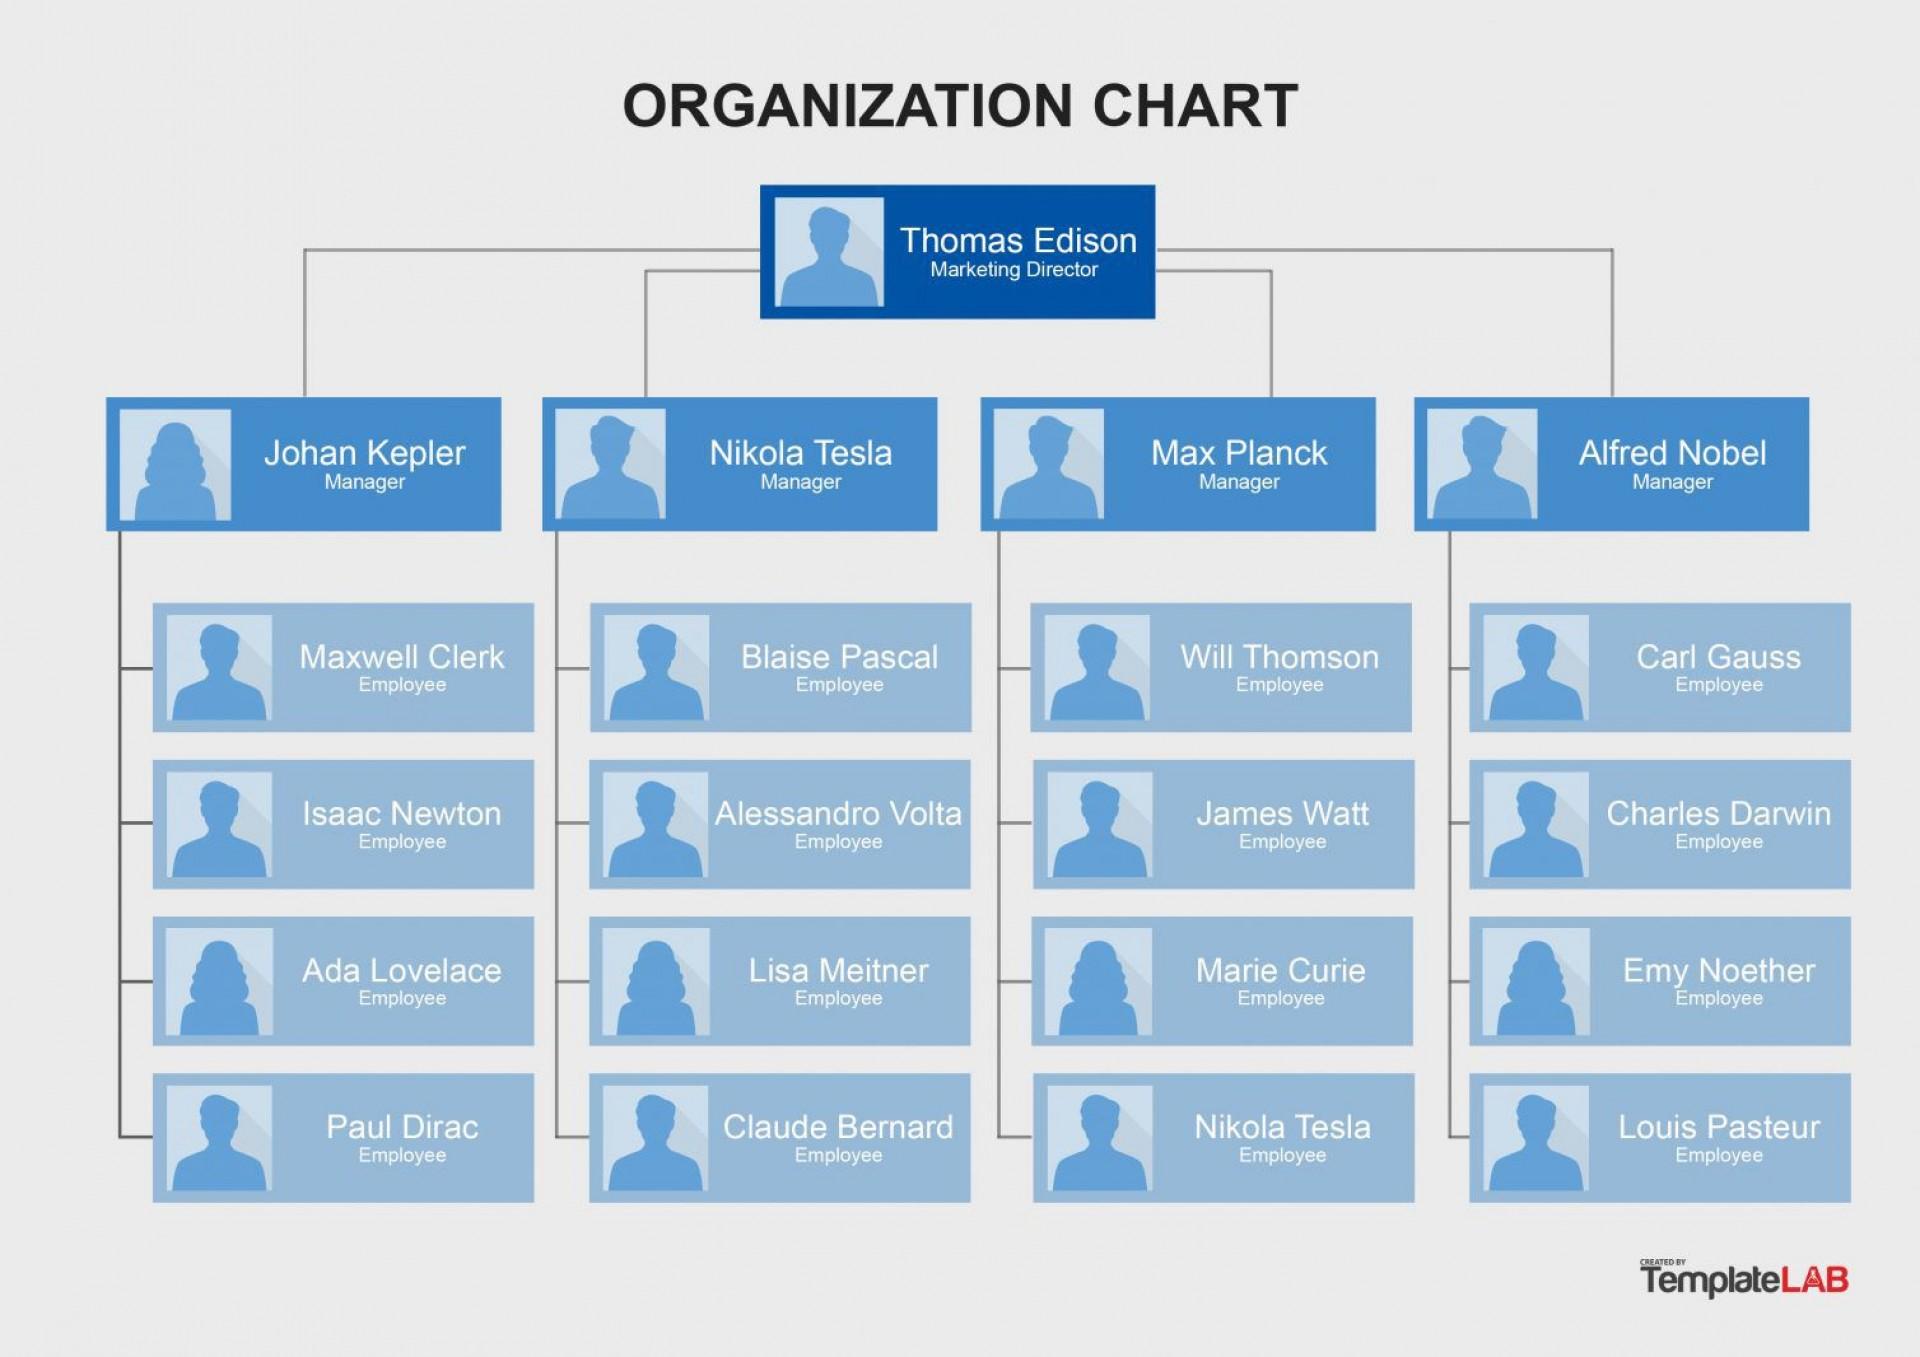 006 Impressive Organizational Chart Template Word Sample  2013 2010 20071920